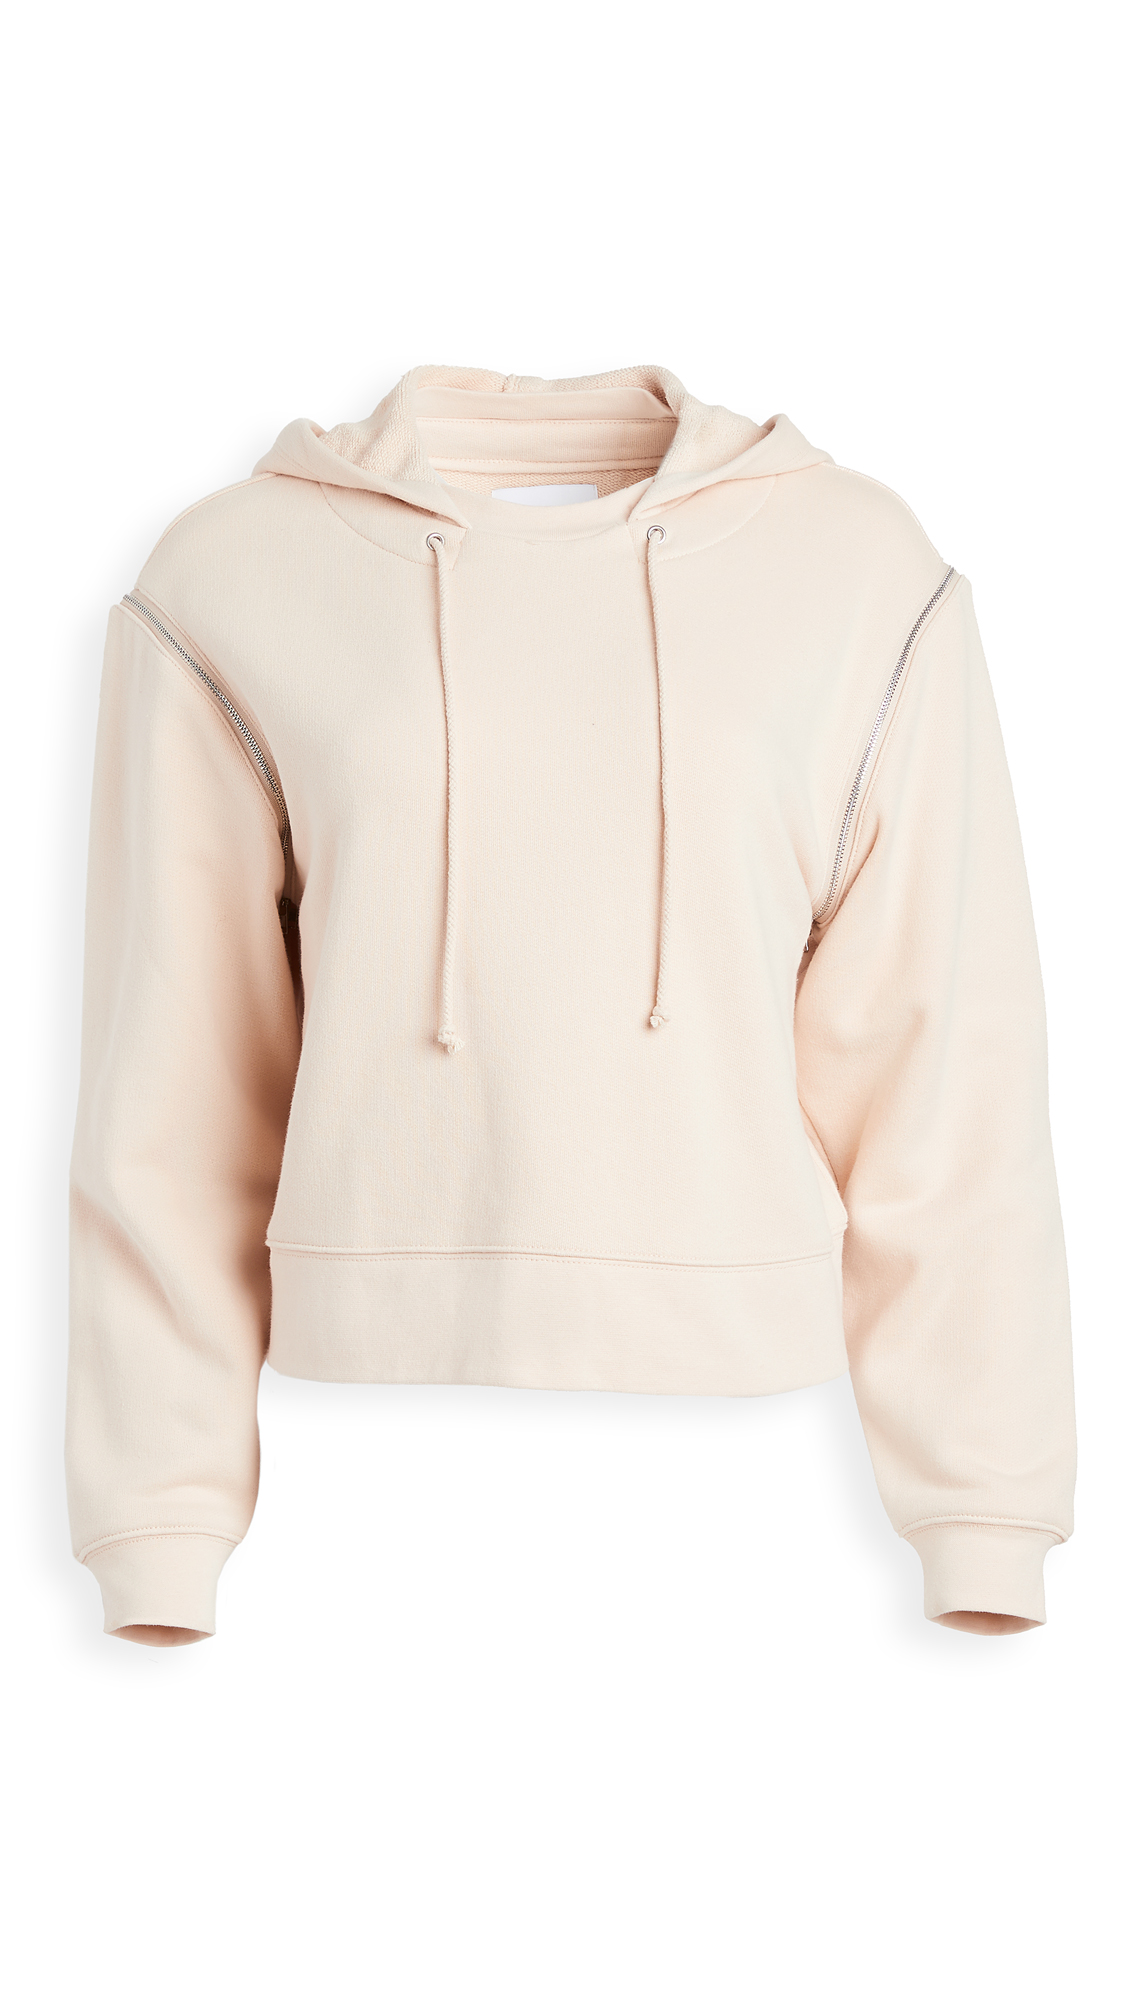 Current/Elliott The Golden State Sweatshirt – 30% Off Sale